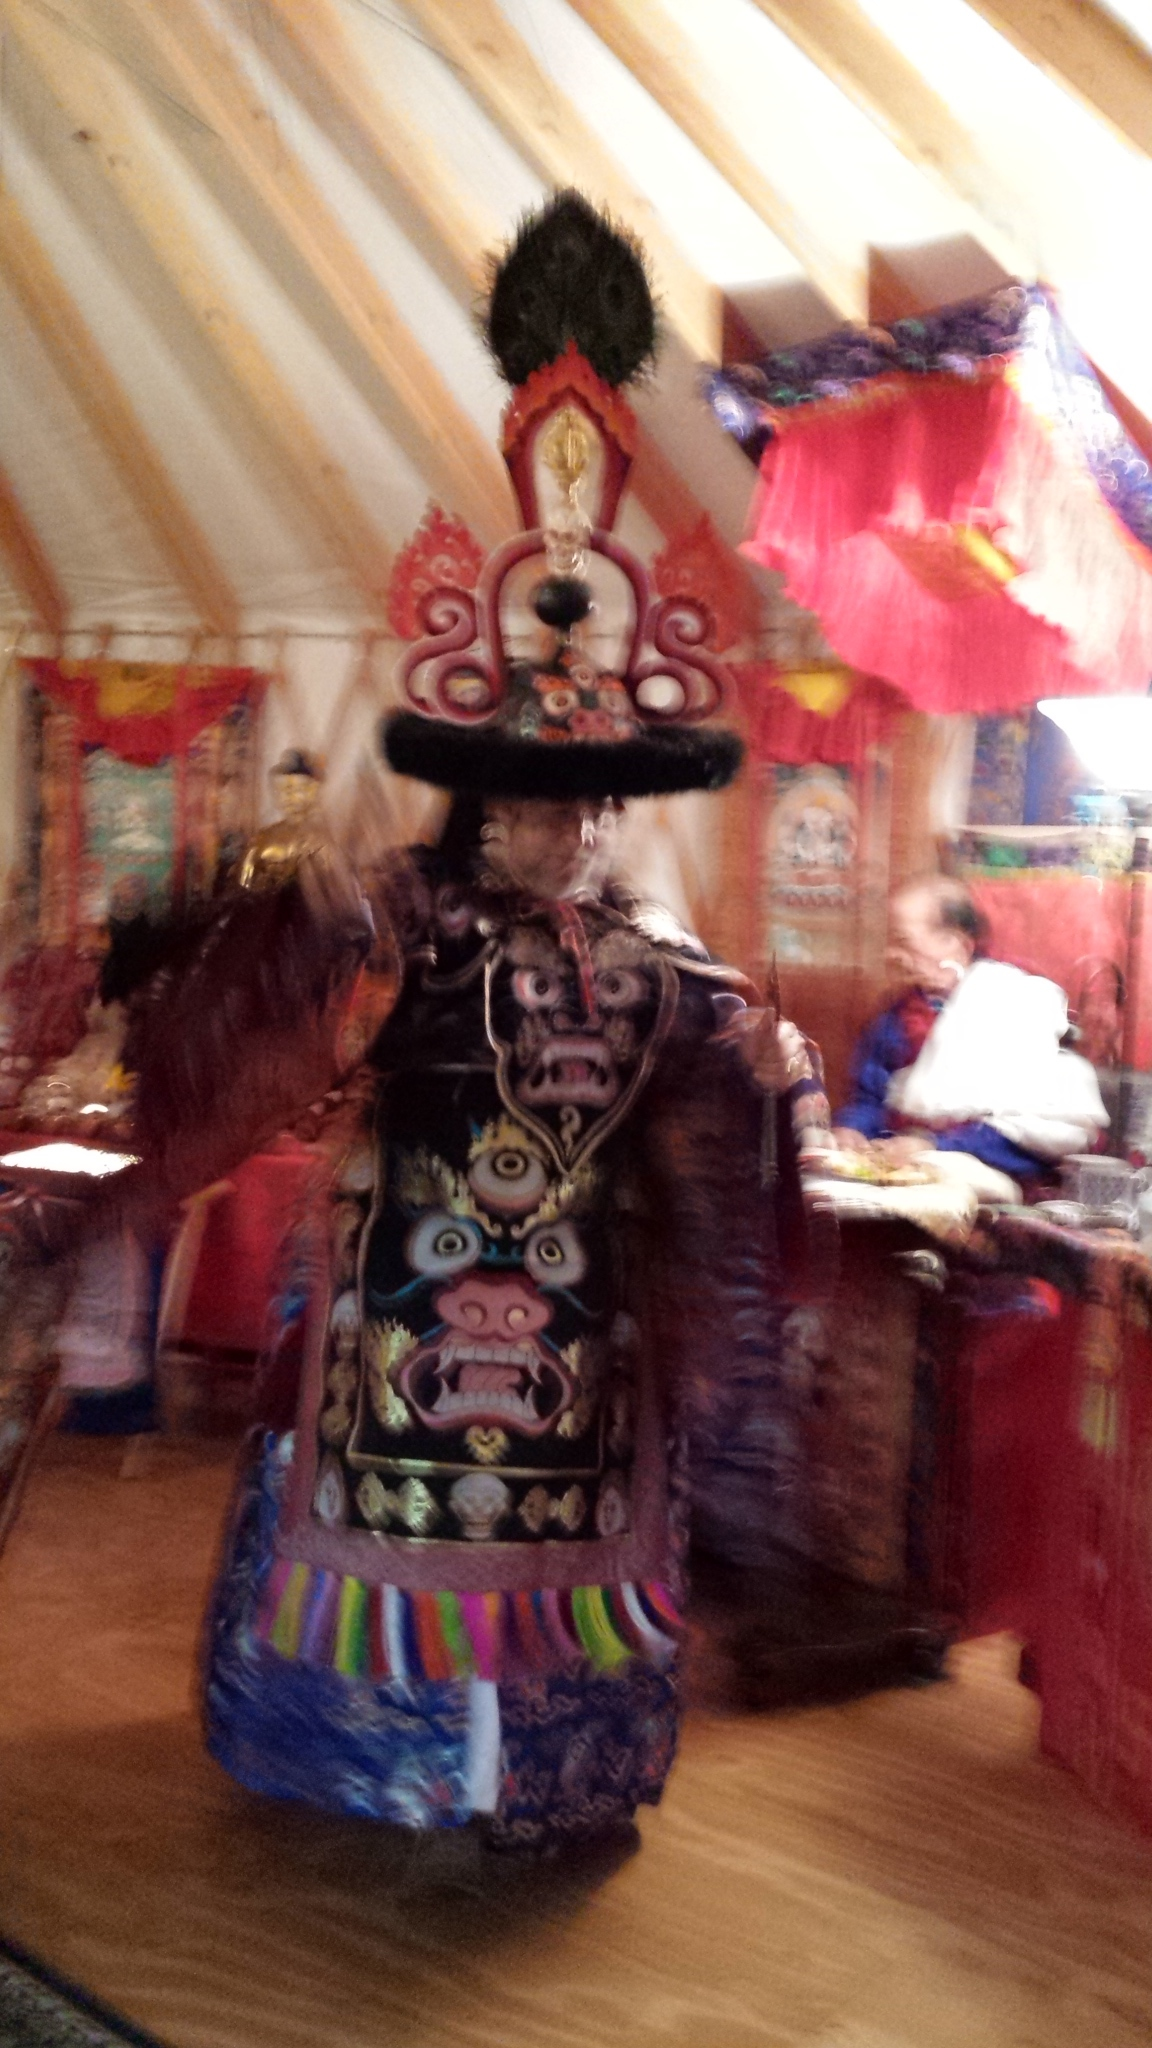 Black Hat Dance to remove hindrances at Phurba Trinlay Ling